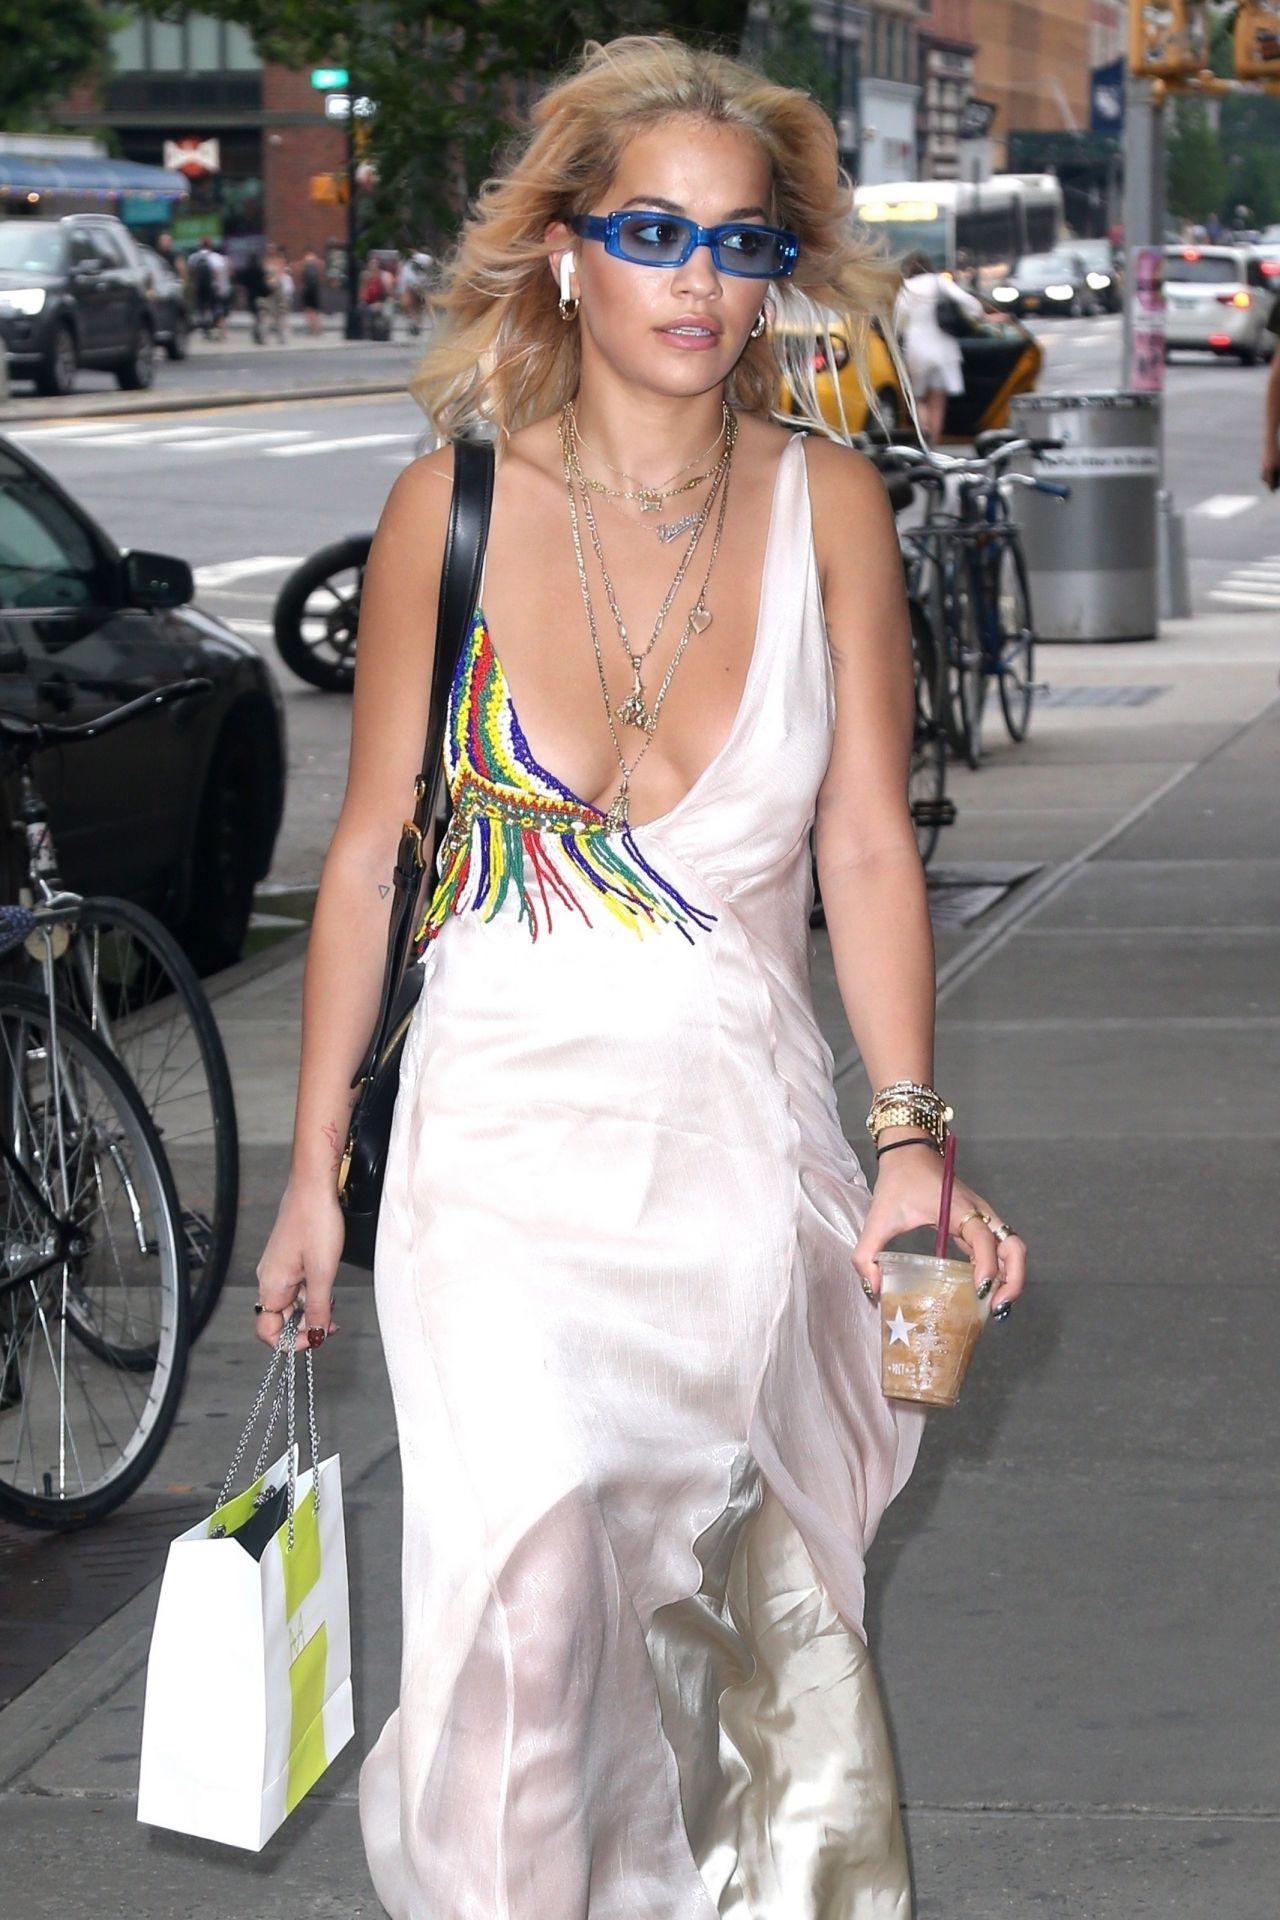 Rita Ora Braless In Low Cut Silk Dress New York City 06